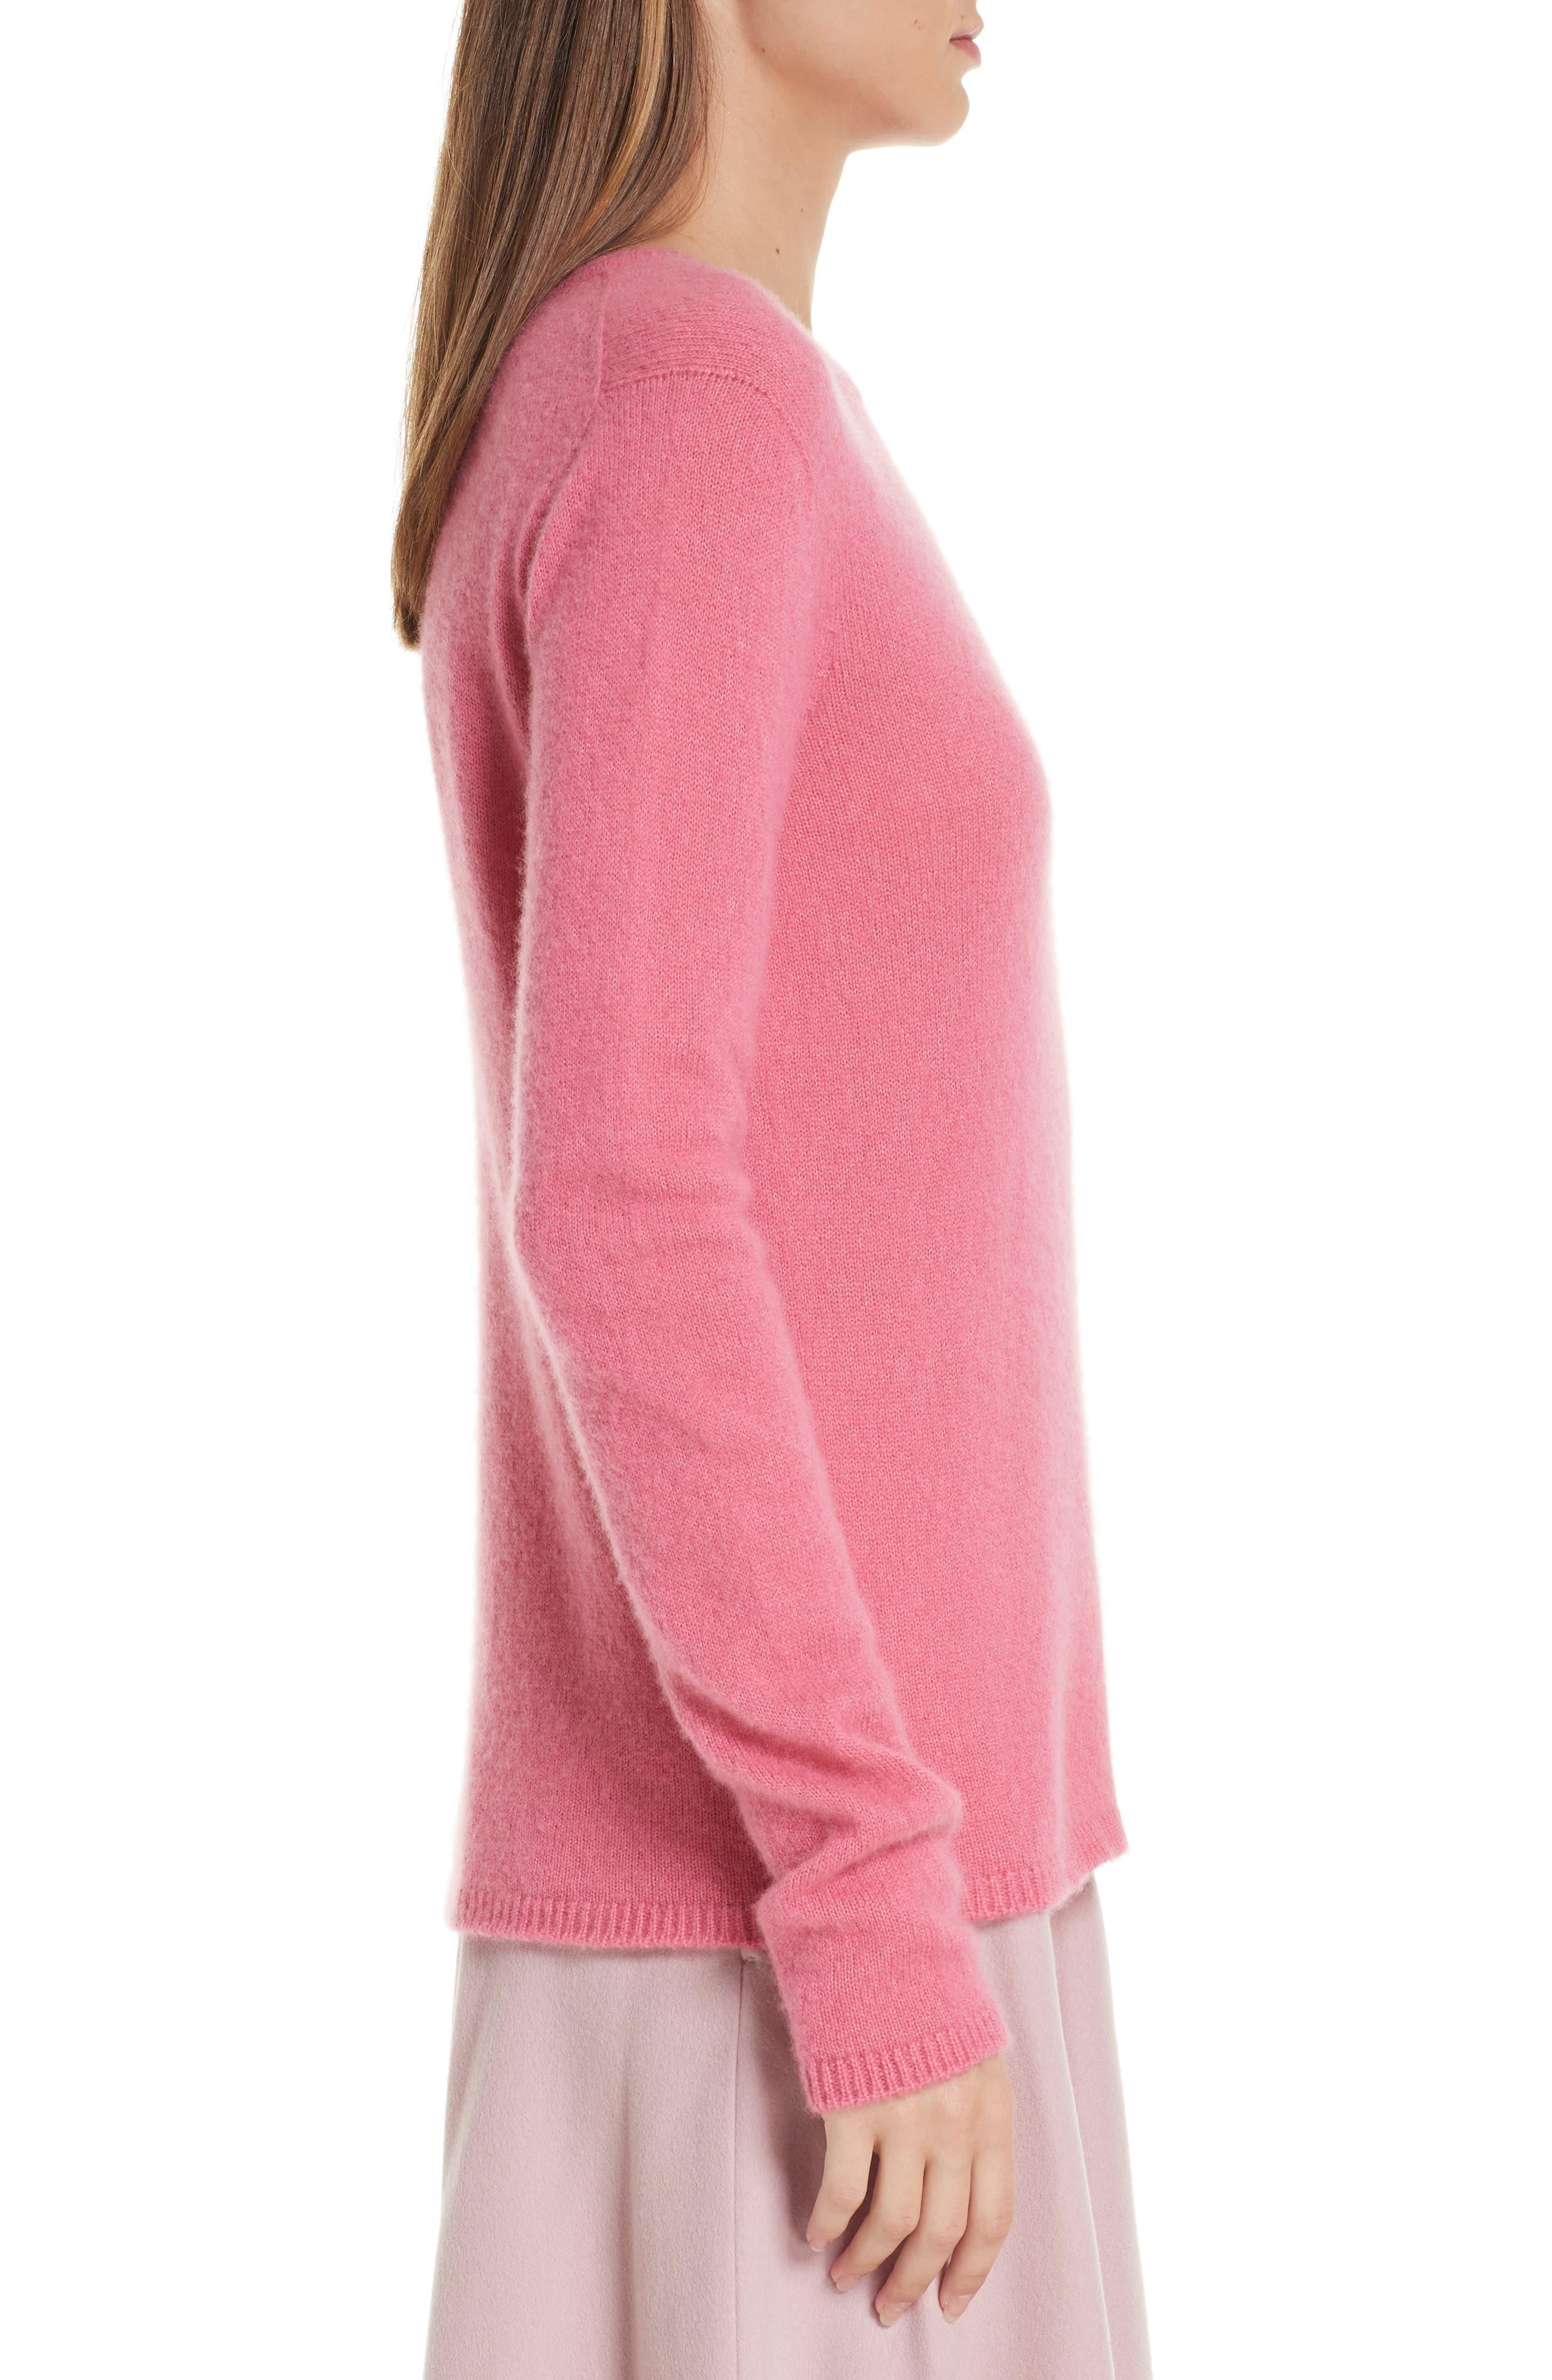 MAX MARA, Stelvio Cashmere & Silk Sweater, Alternate thumbnail 3, color, 672